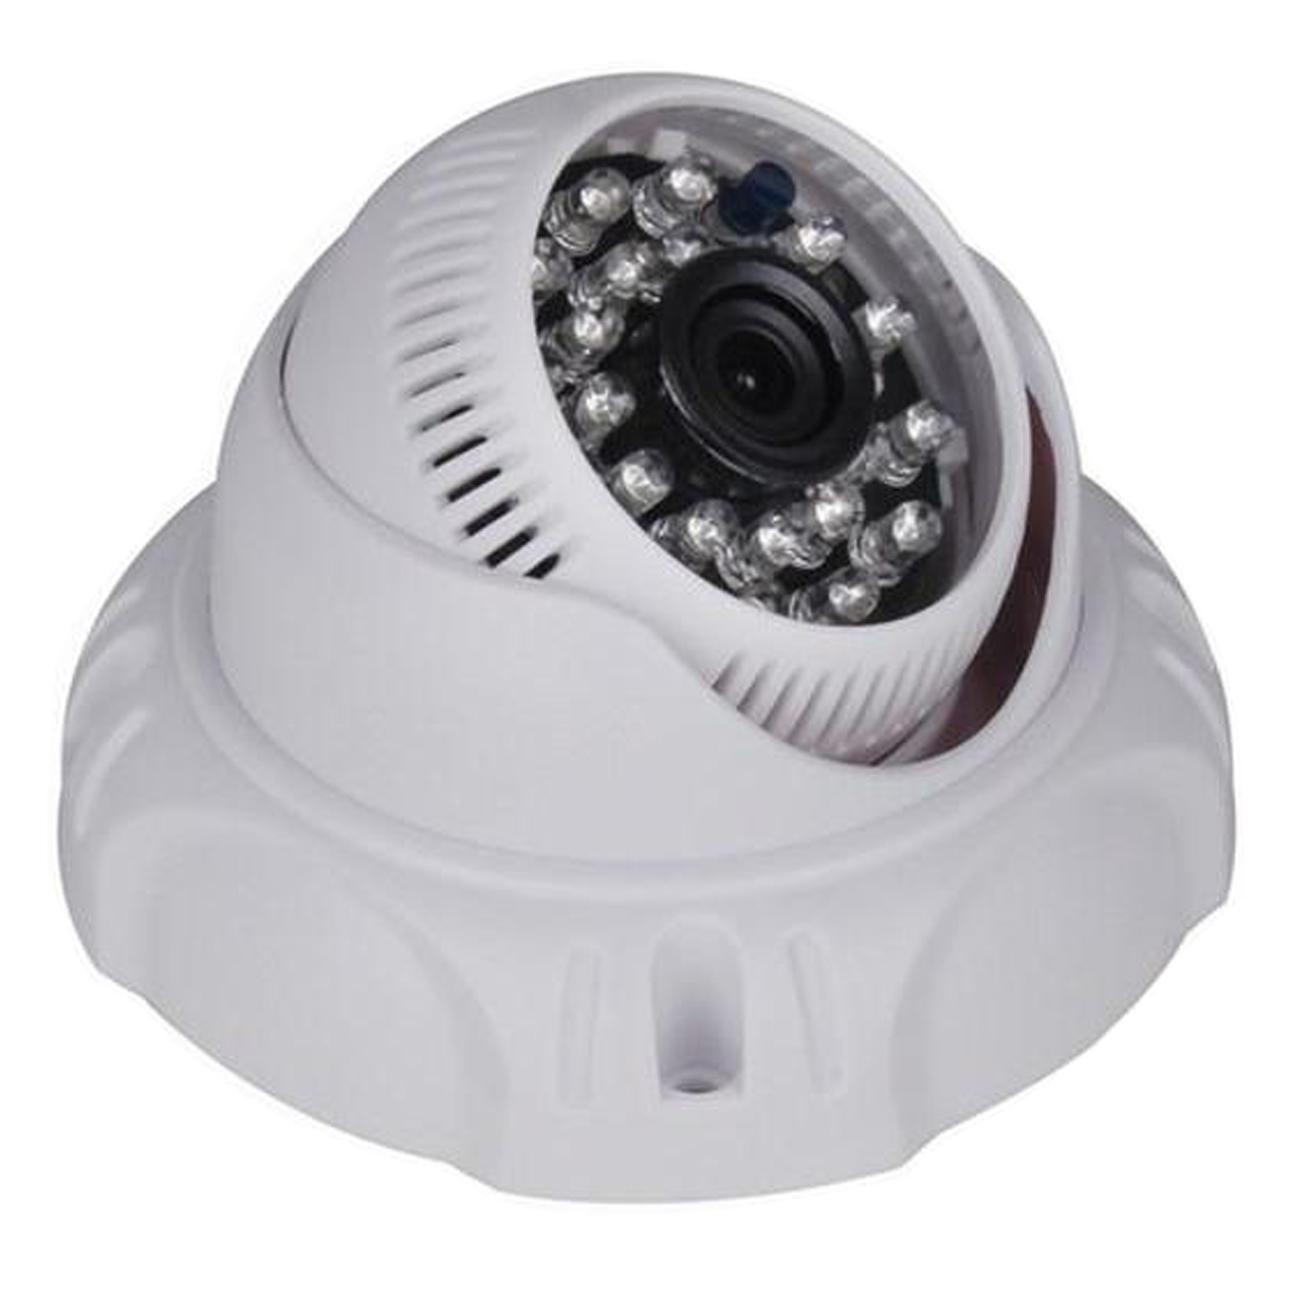 Фото Купольная камера AHD Rexant 2.1 Мп Full HD Rexant (1080P), ИК до 20 м {45-0263}